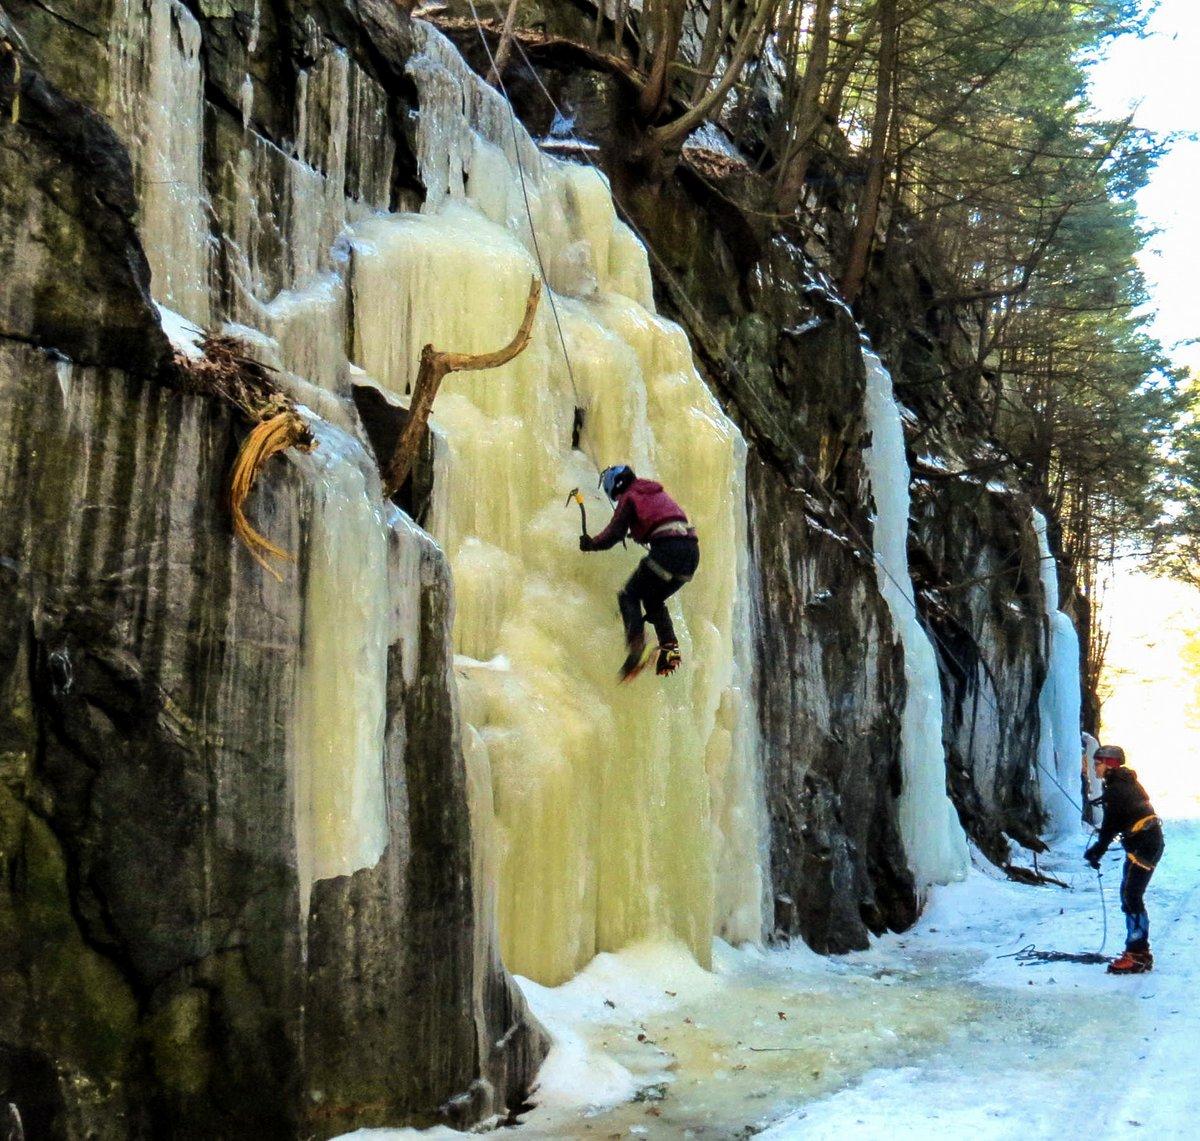 4. Ice  Climber